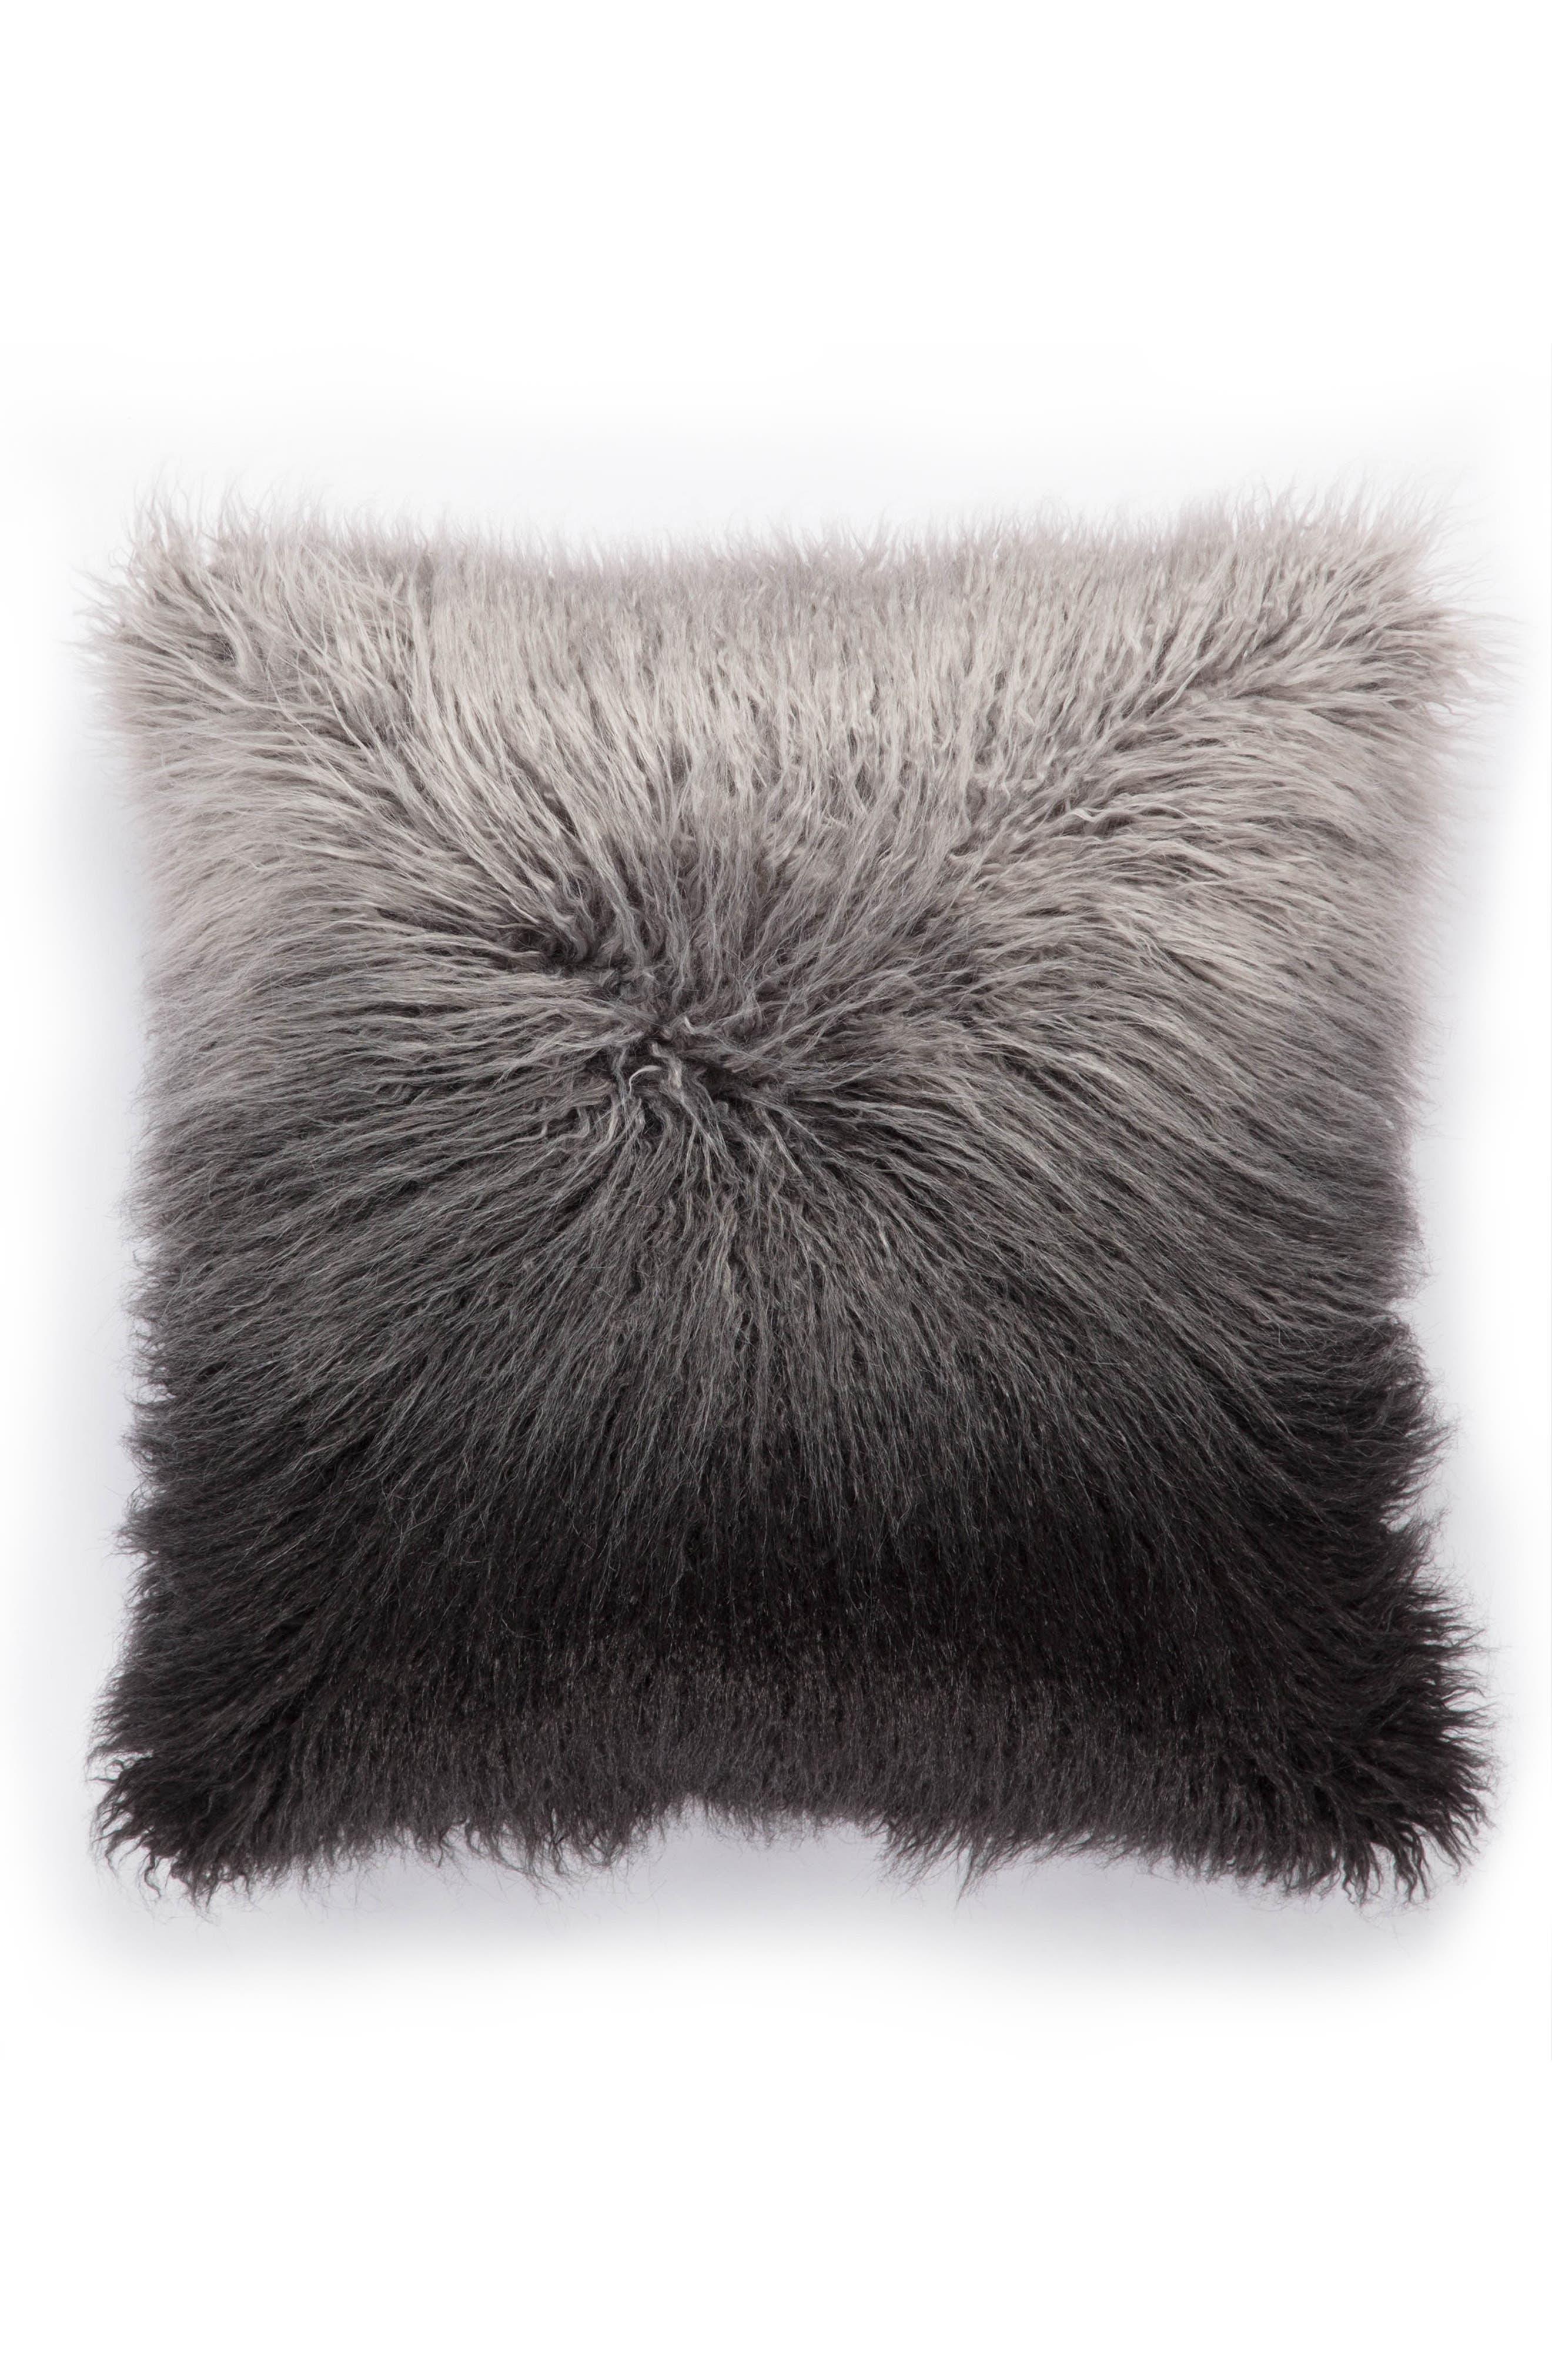 Main Image - Jaipur Mahal Faux Fur Accent Pillow